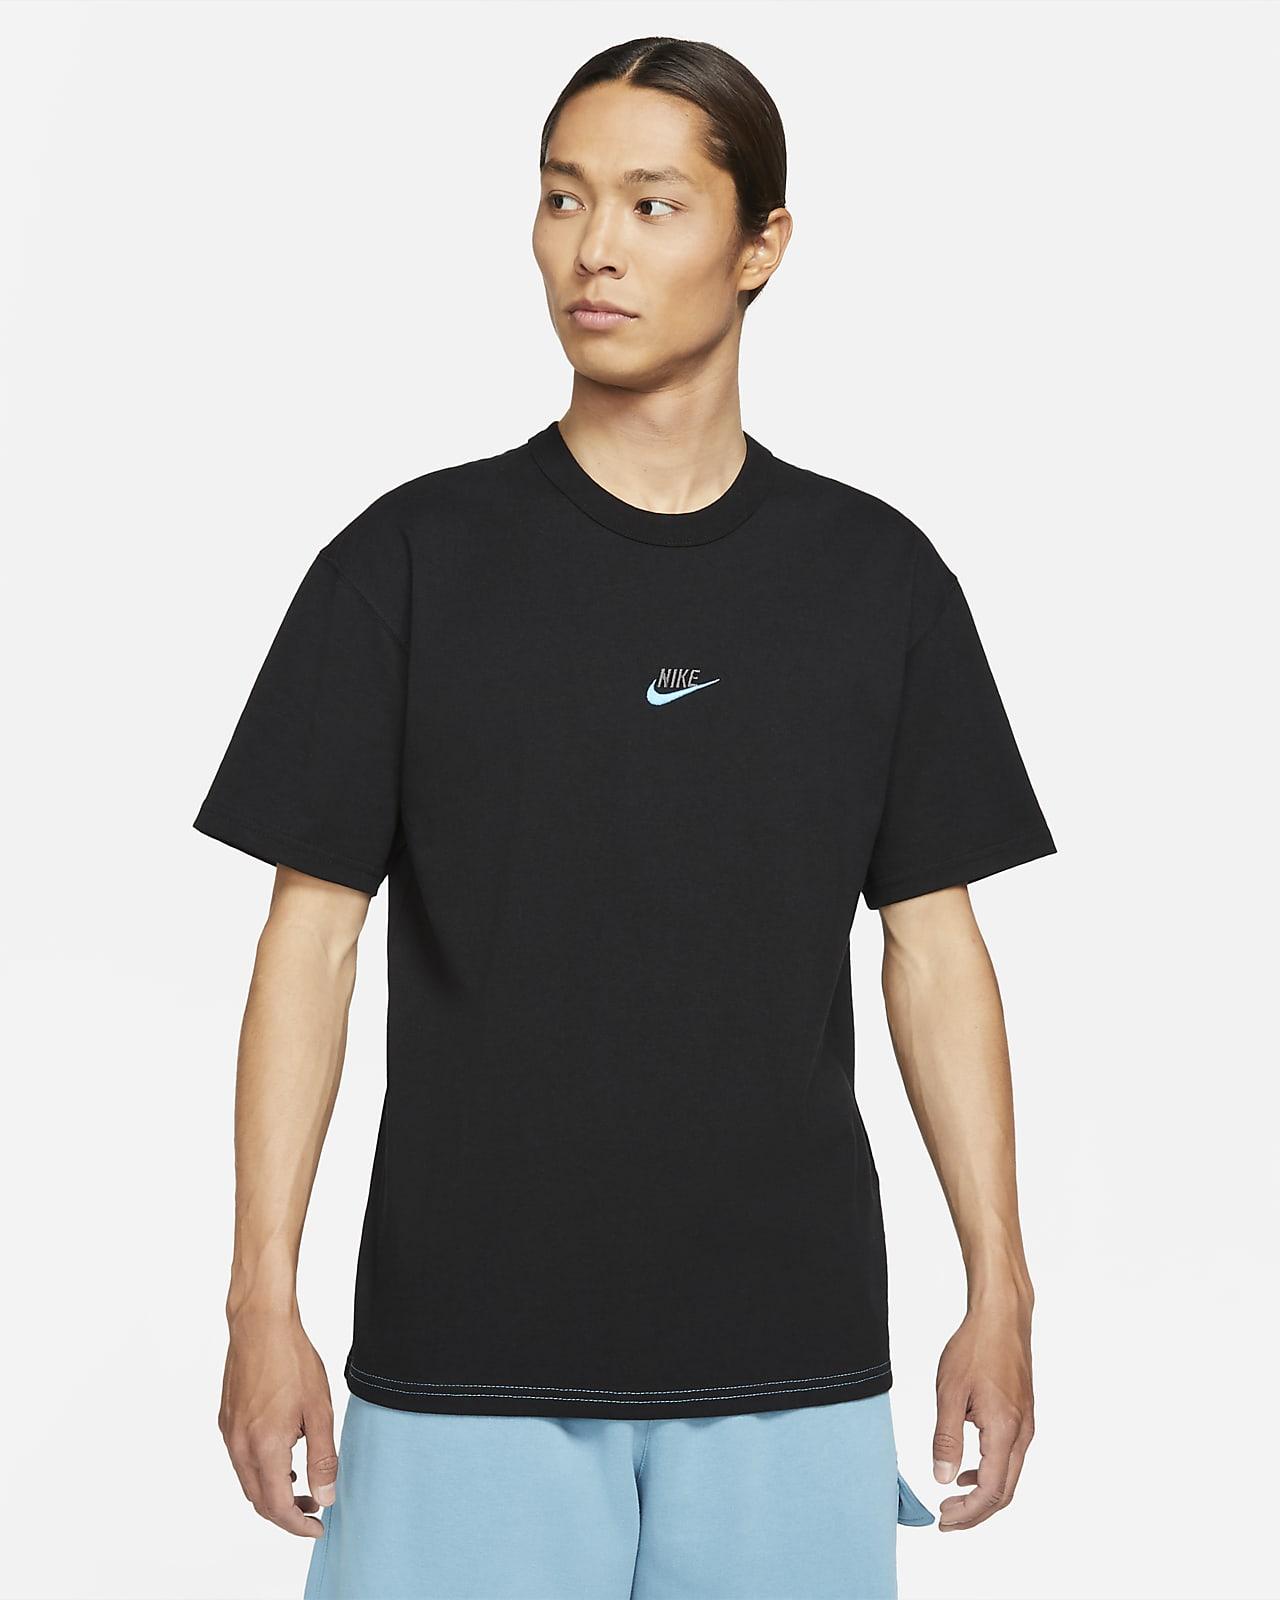 Nike Sportswear Premium Essential 男款 T 恤